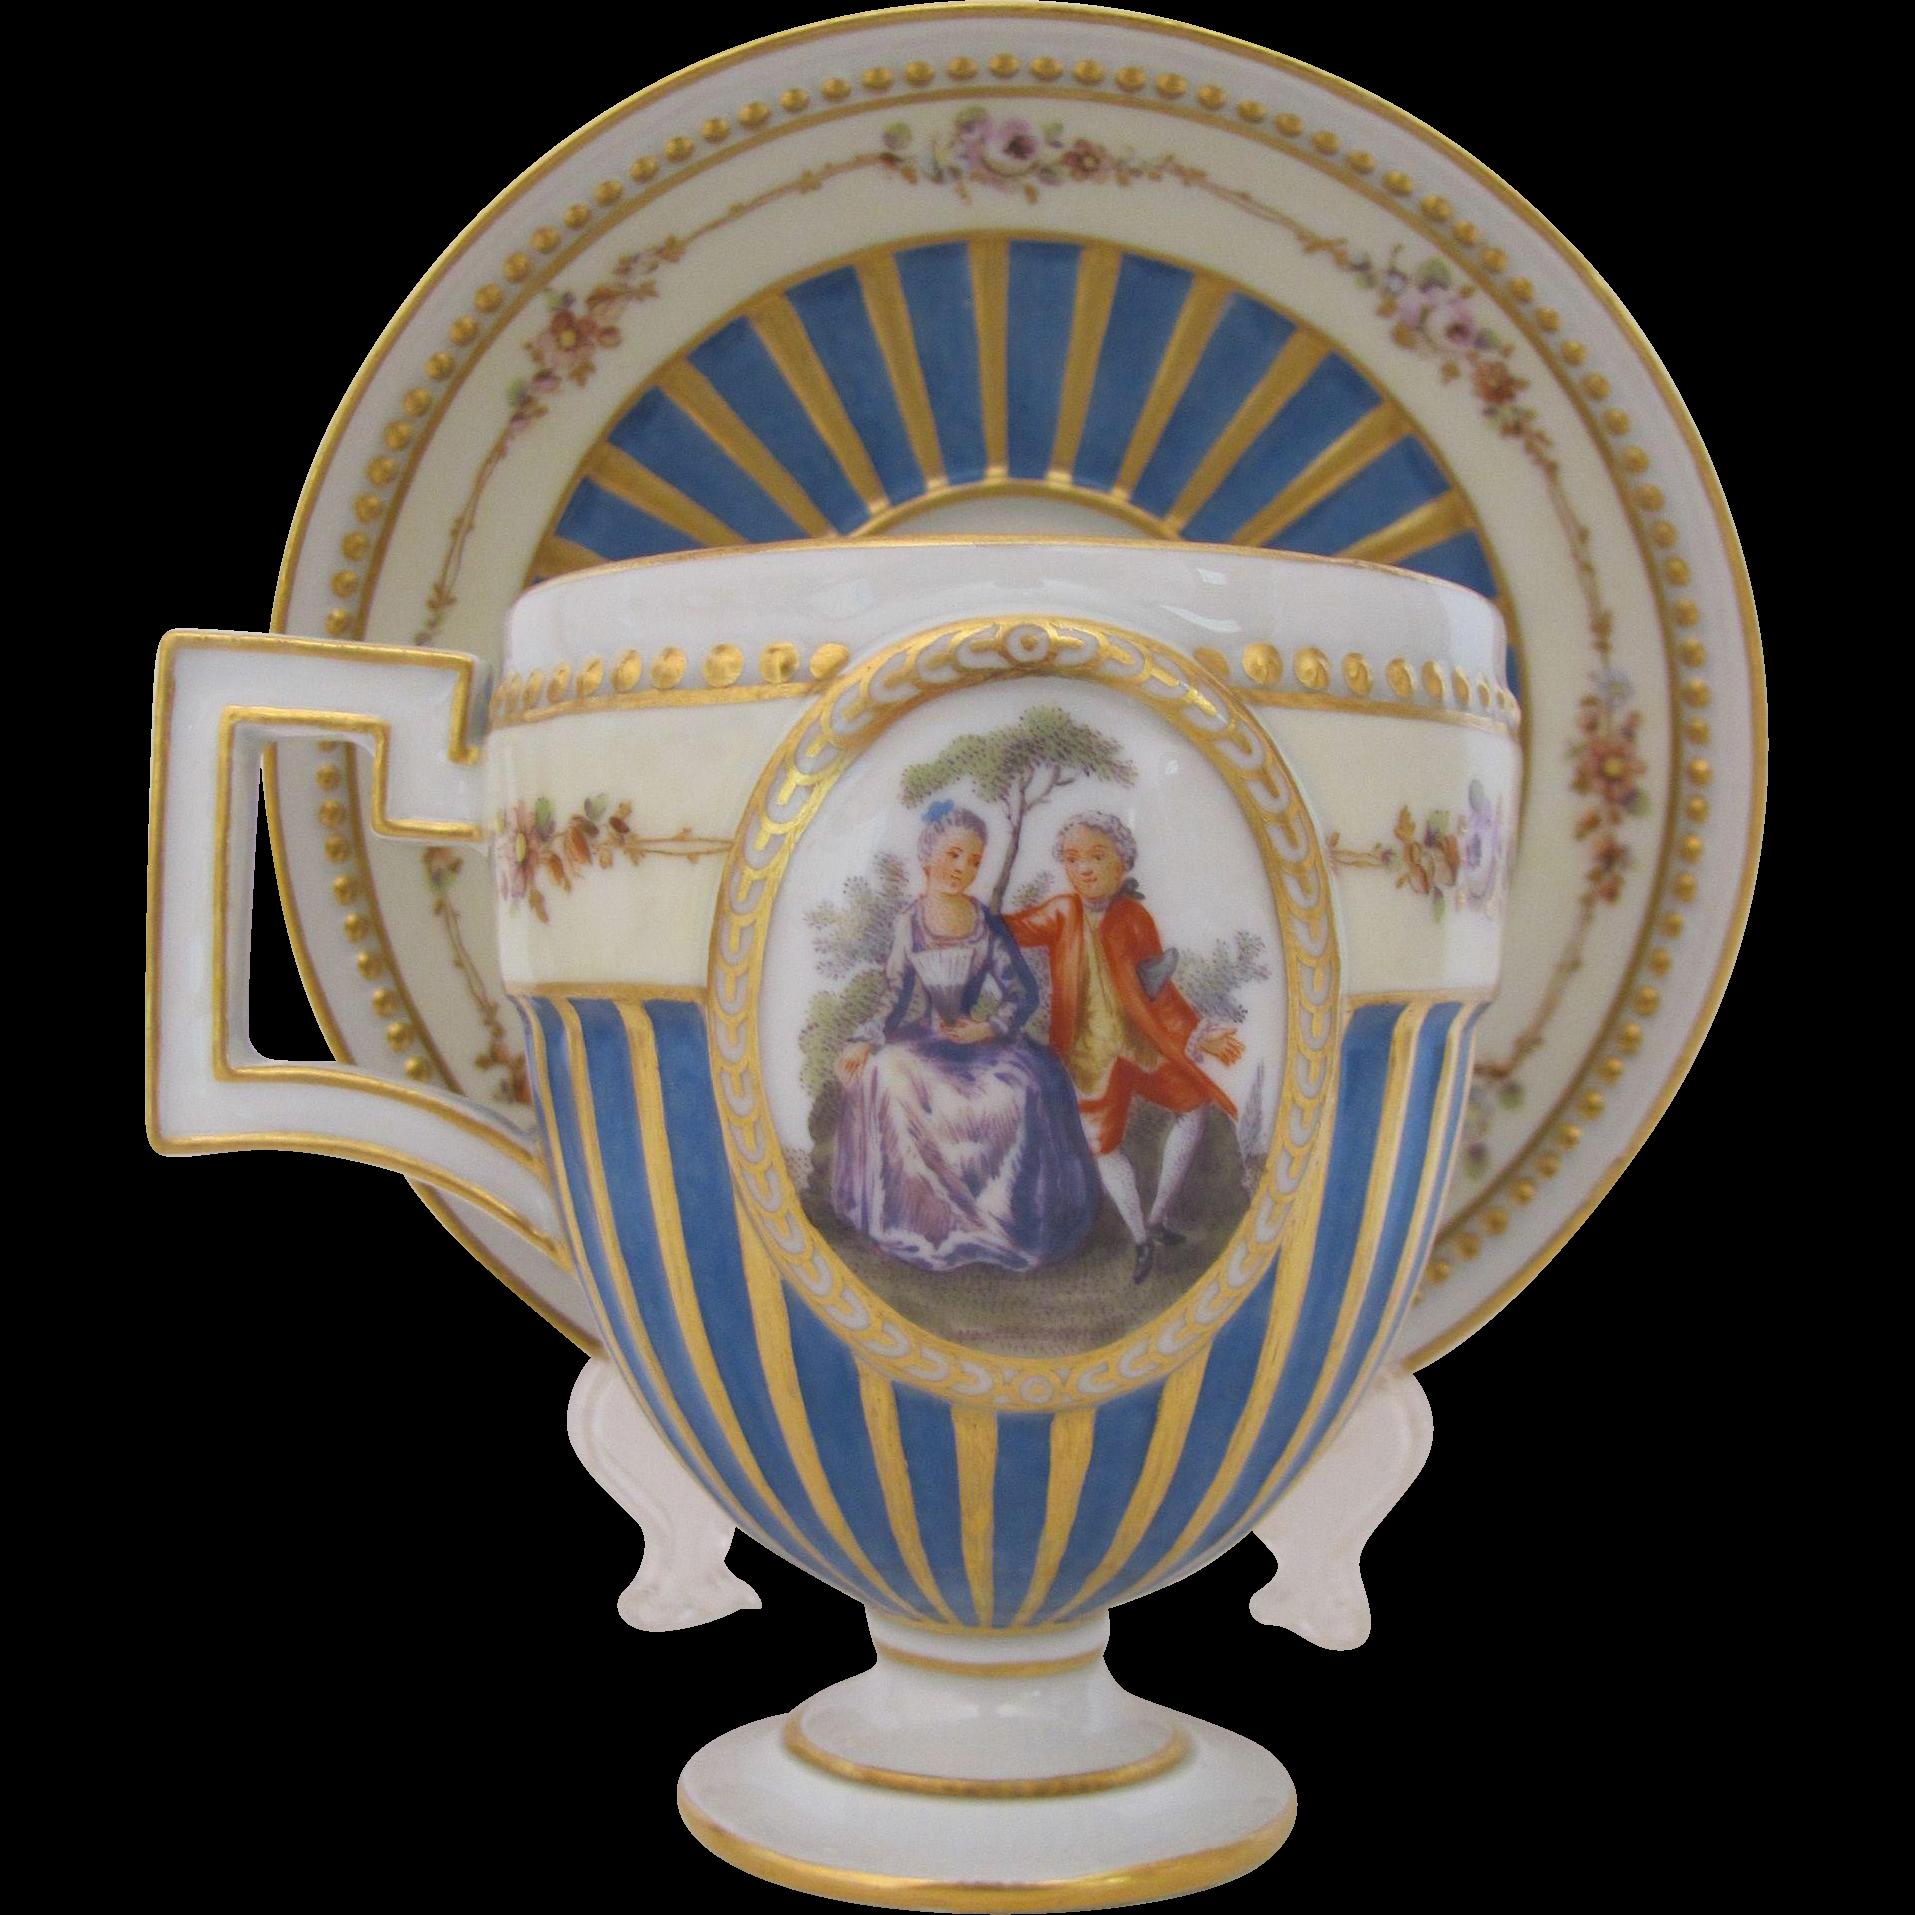 Meissen Pedestal Cup Saucer Marcolini Period c.1774-1814 Gold Enamel Beads